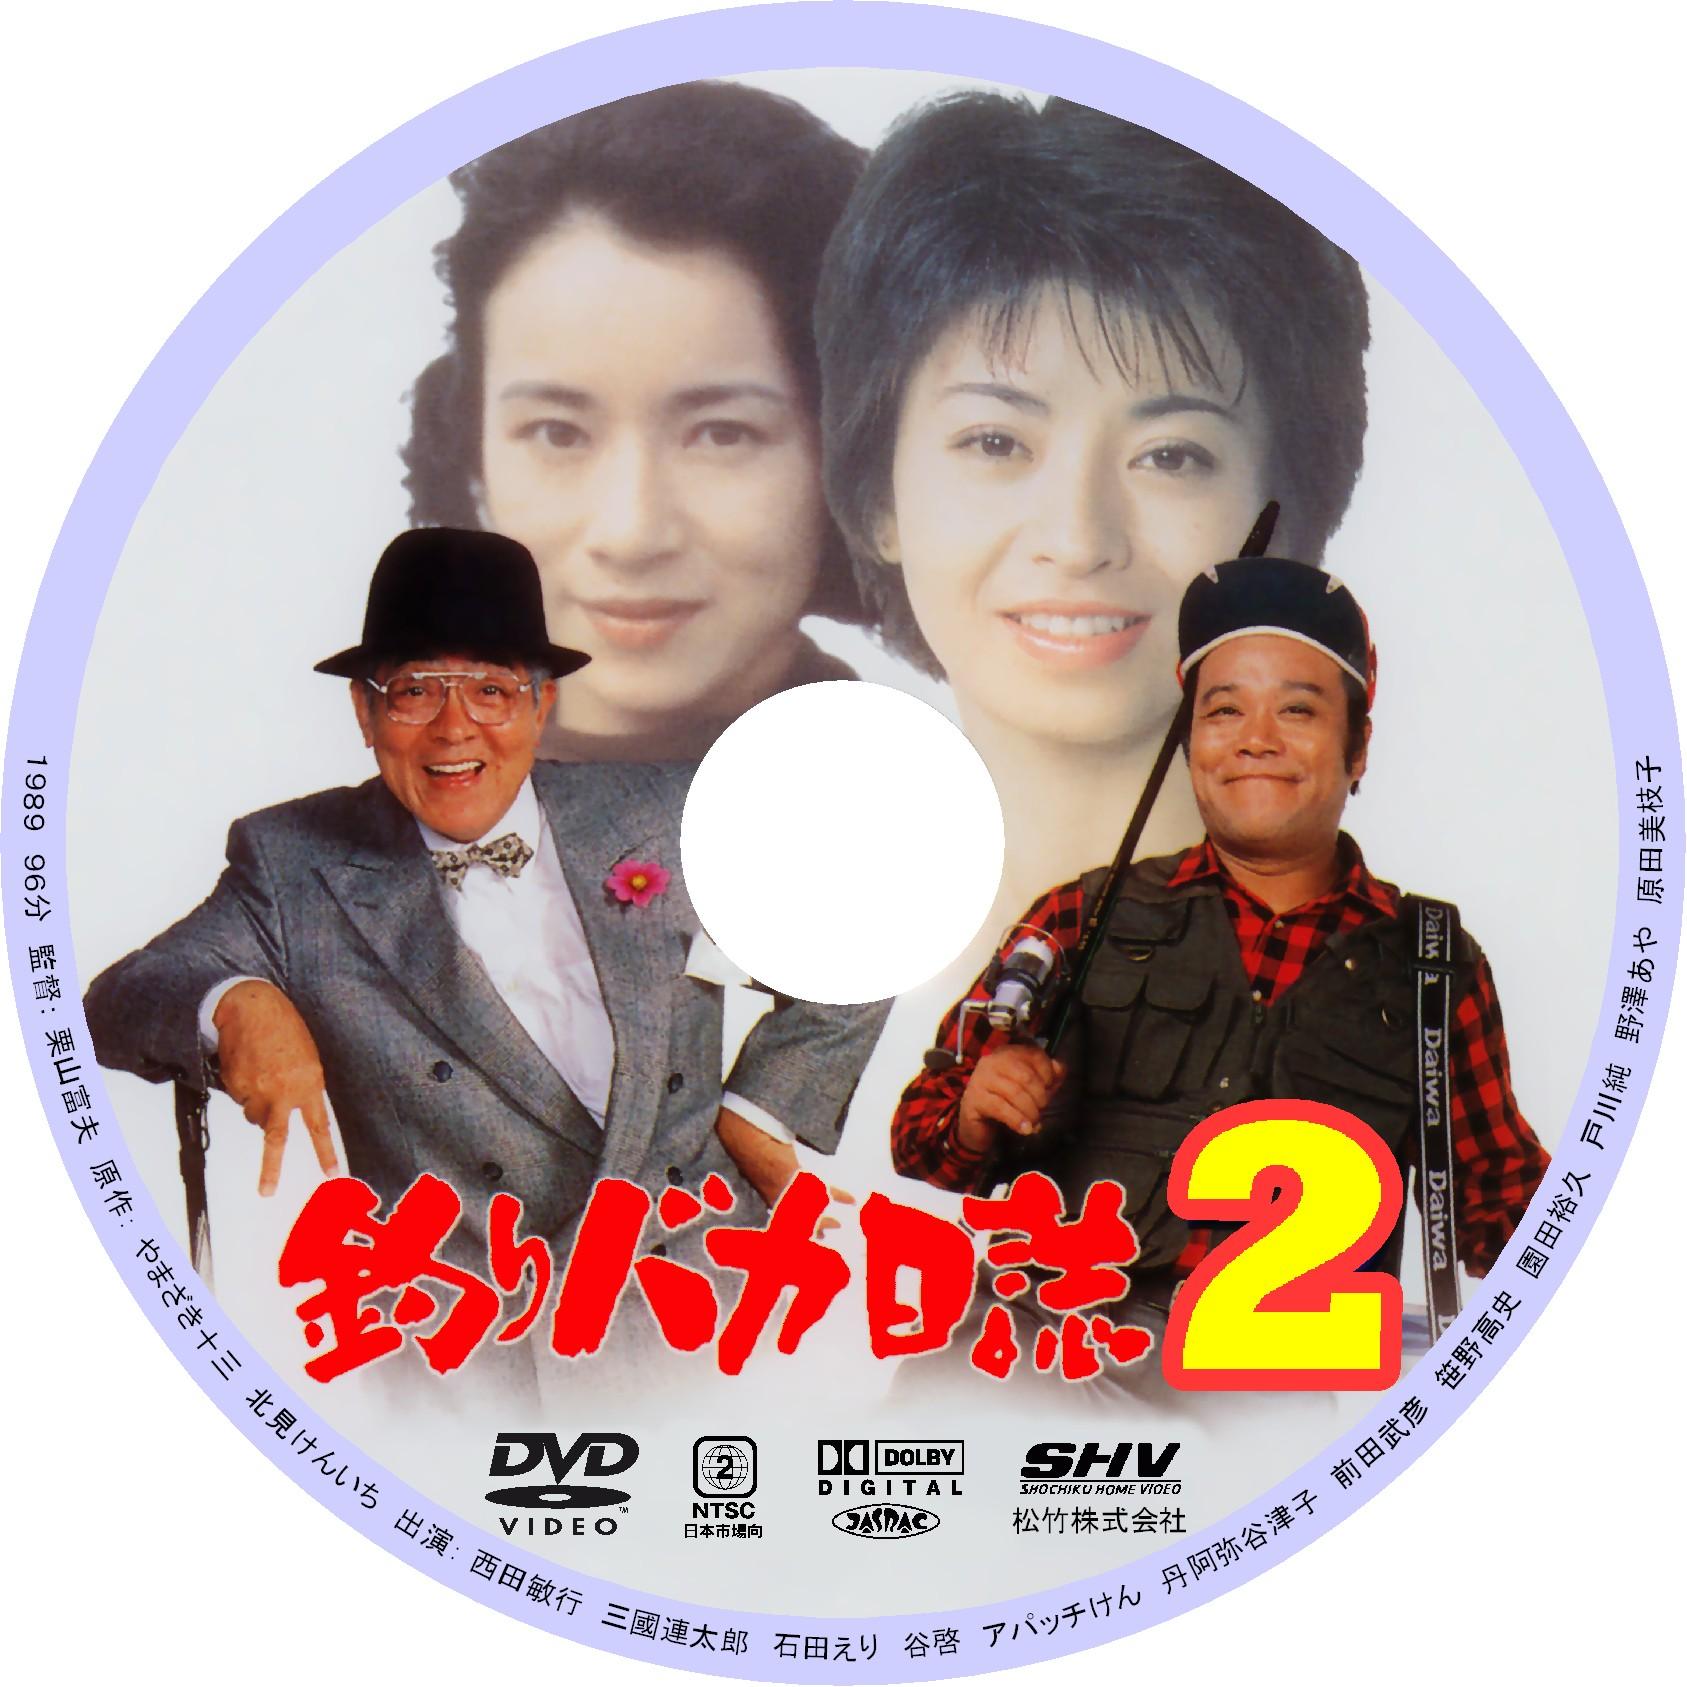 DVDデータベース : 釣りバカ日誌...